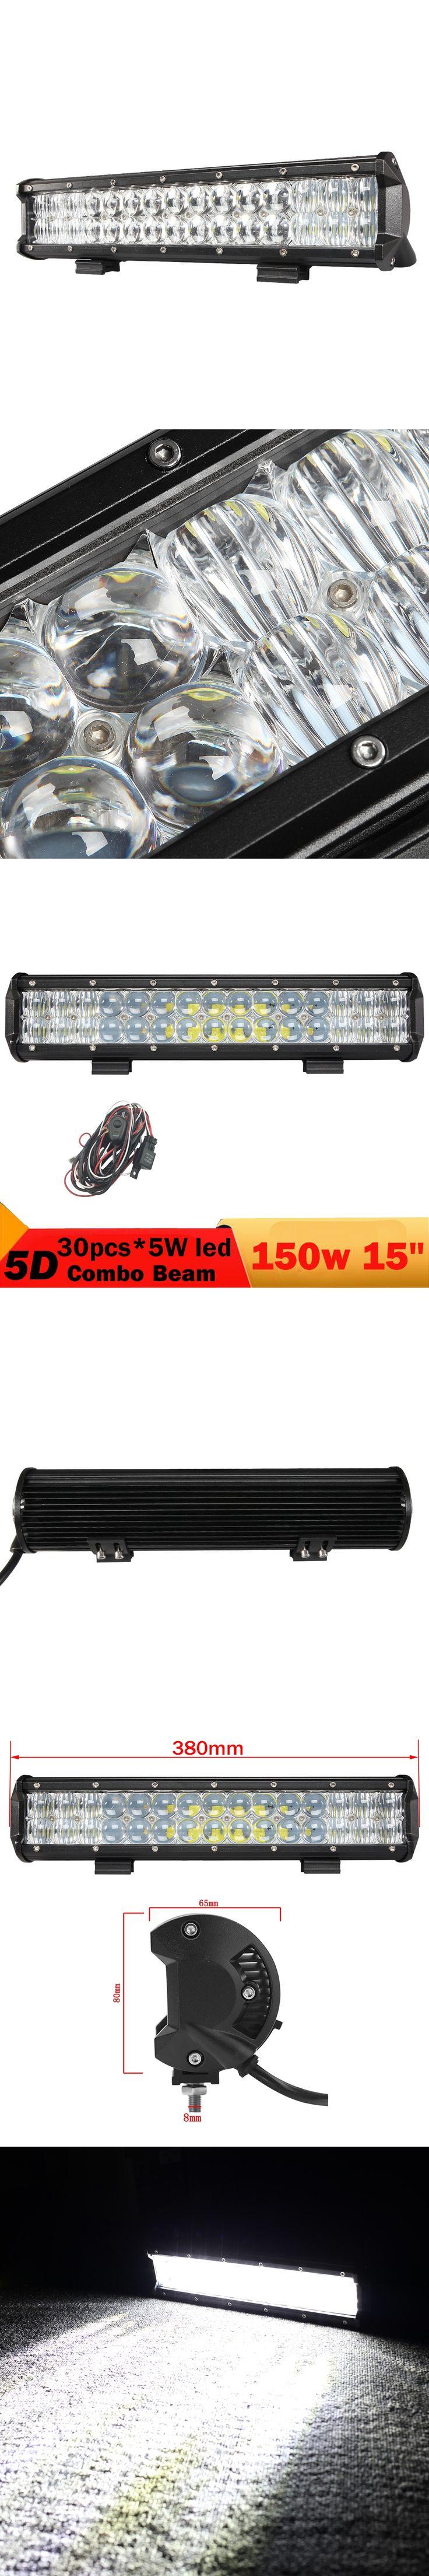 5D 150W Offroad LED Work Light Bar 15'' Combo Car Auto SUV Boat 4WD 4X4 ATV UTB Boat Wagon Pickup Truck Trailer Headlamp 12V 24V